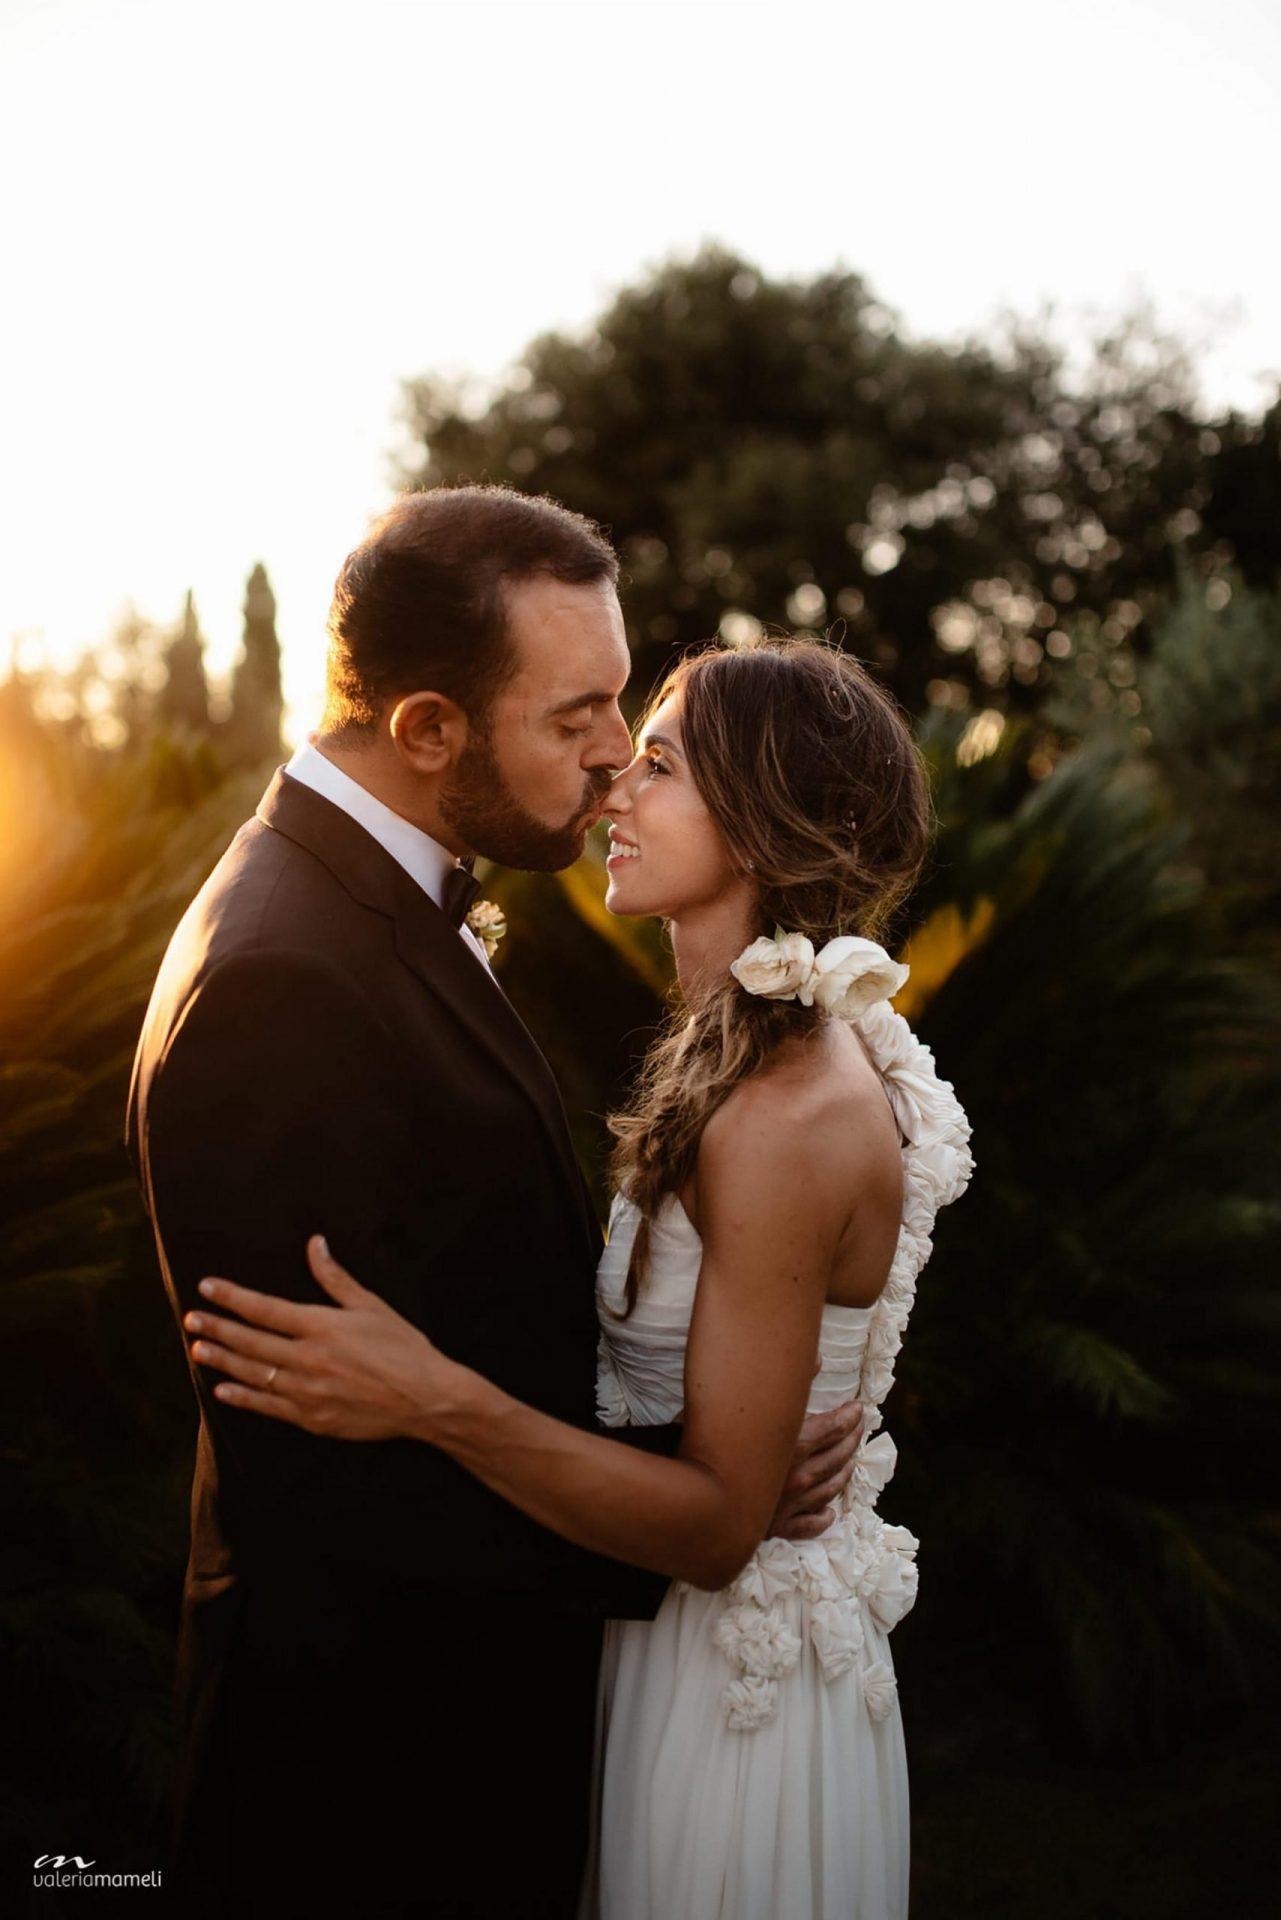 Francesca and Francesco, the bride and the groom